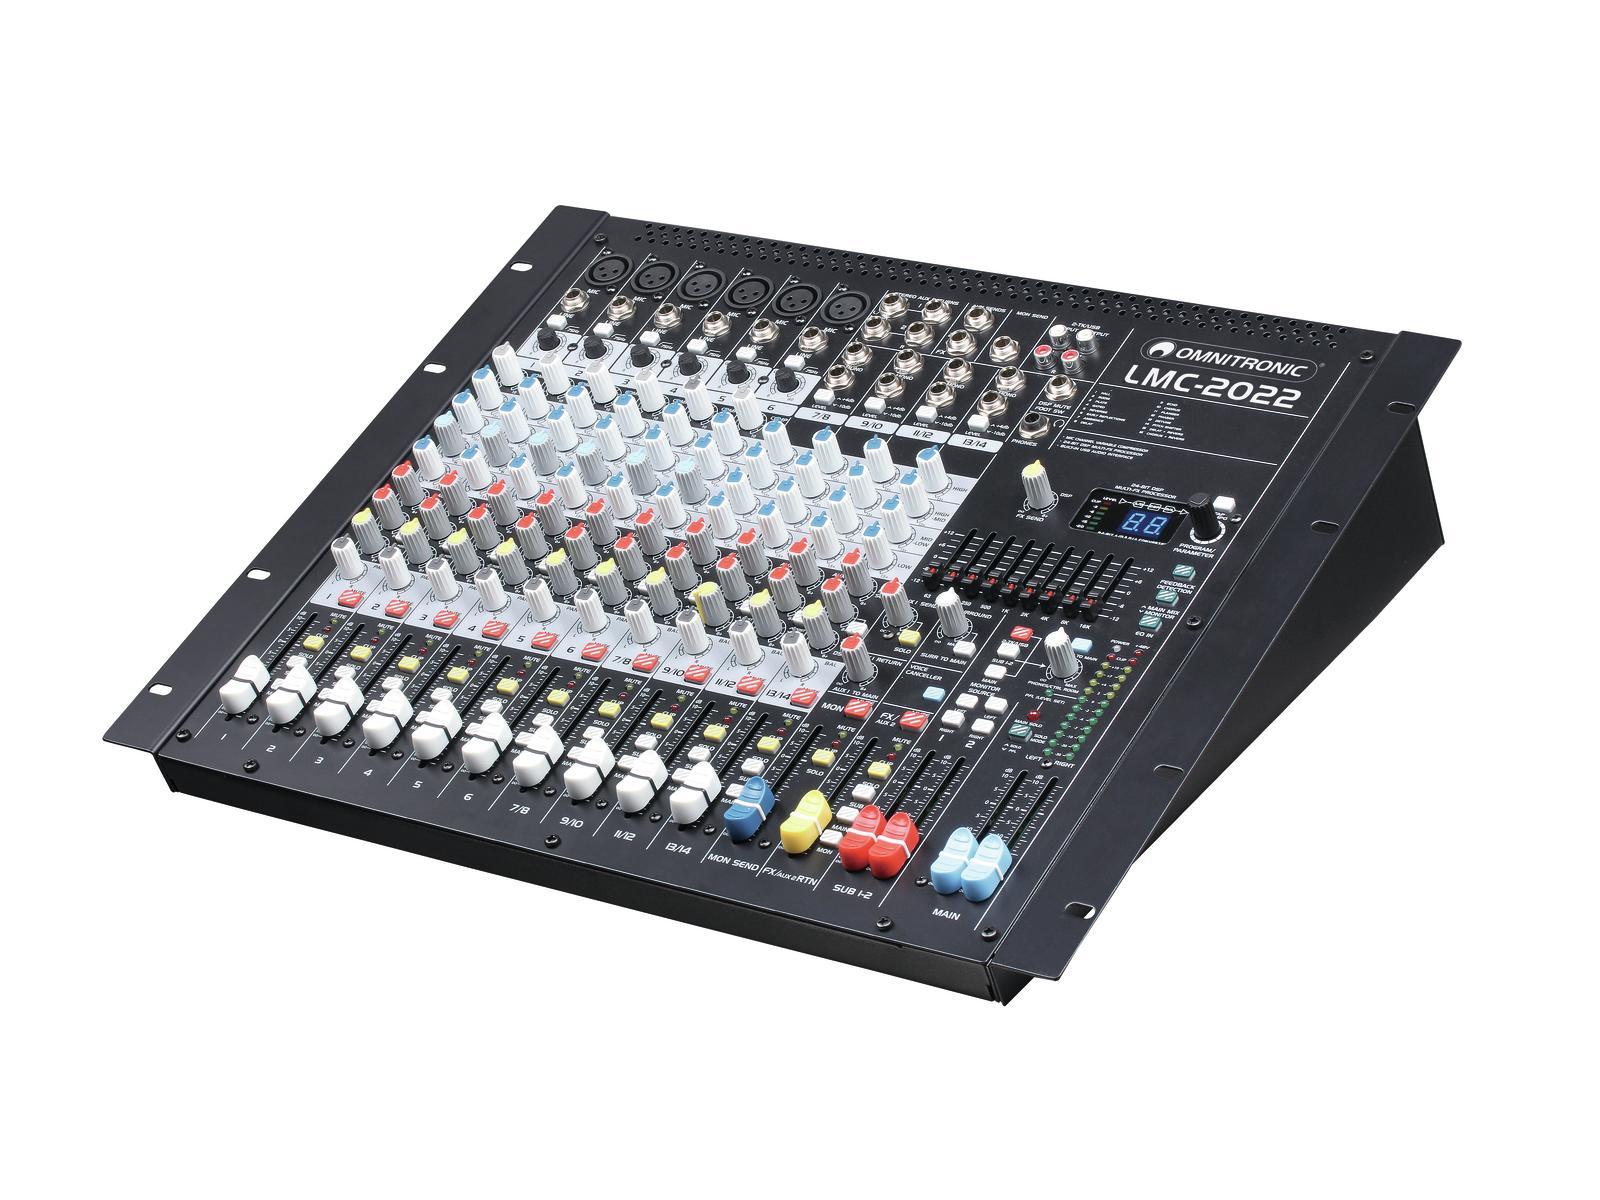 OMNITRONIC LMC-2022FX USB mixer